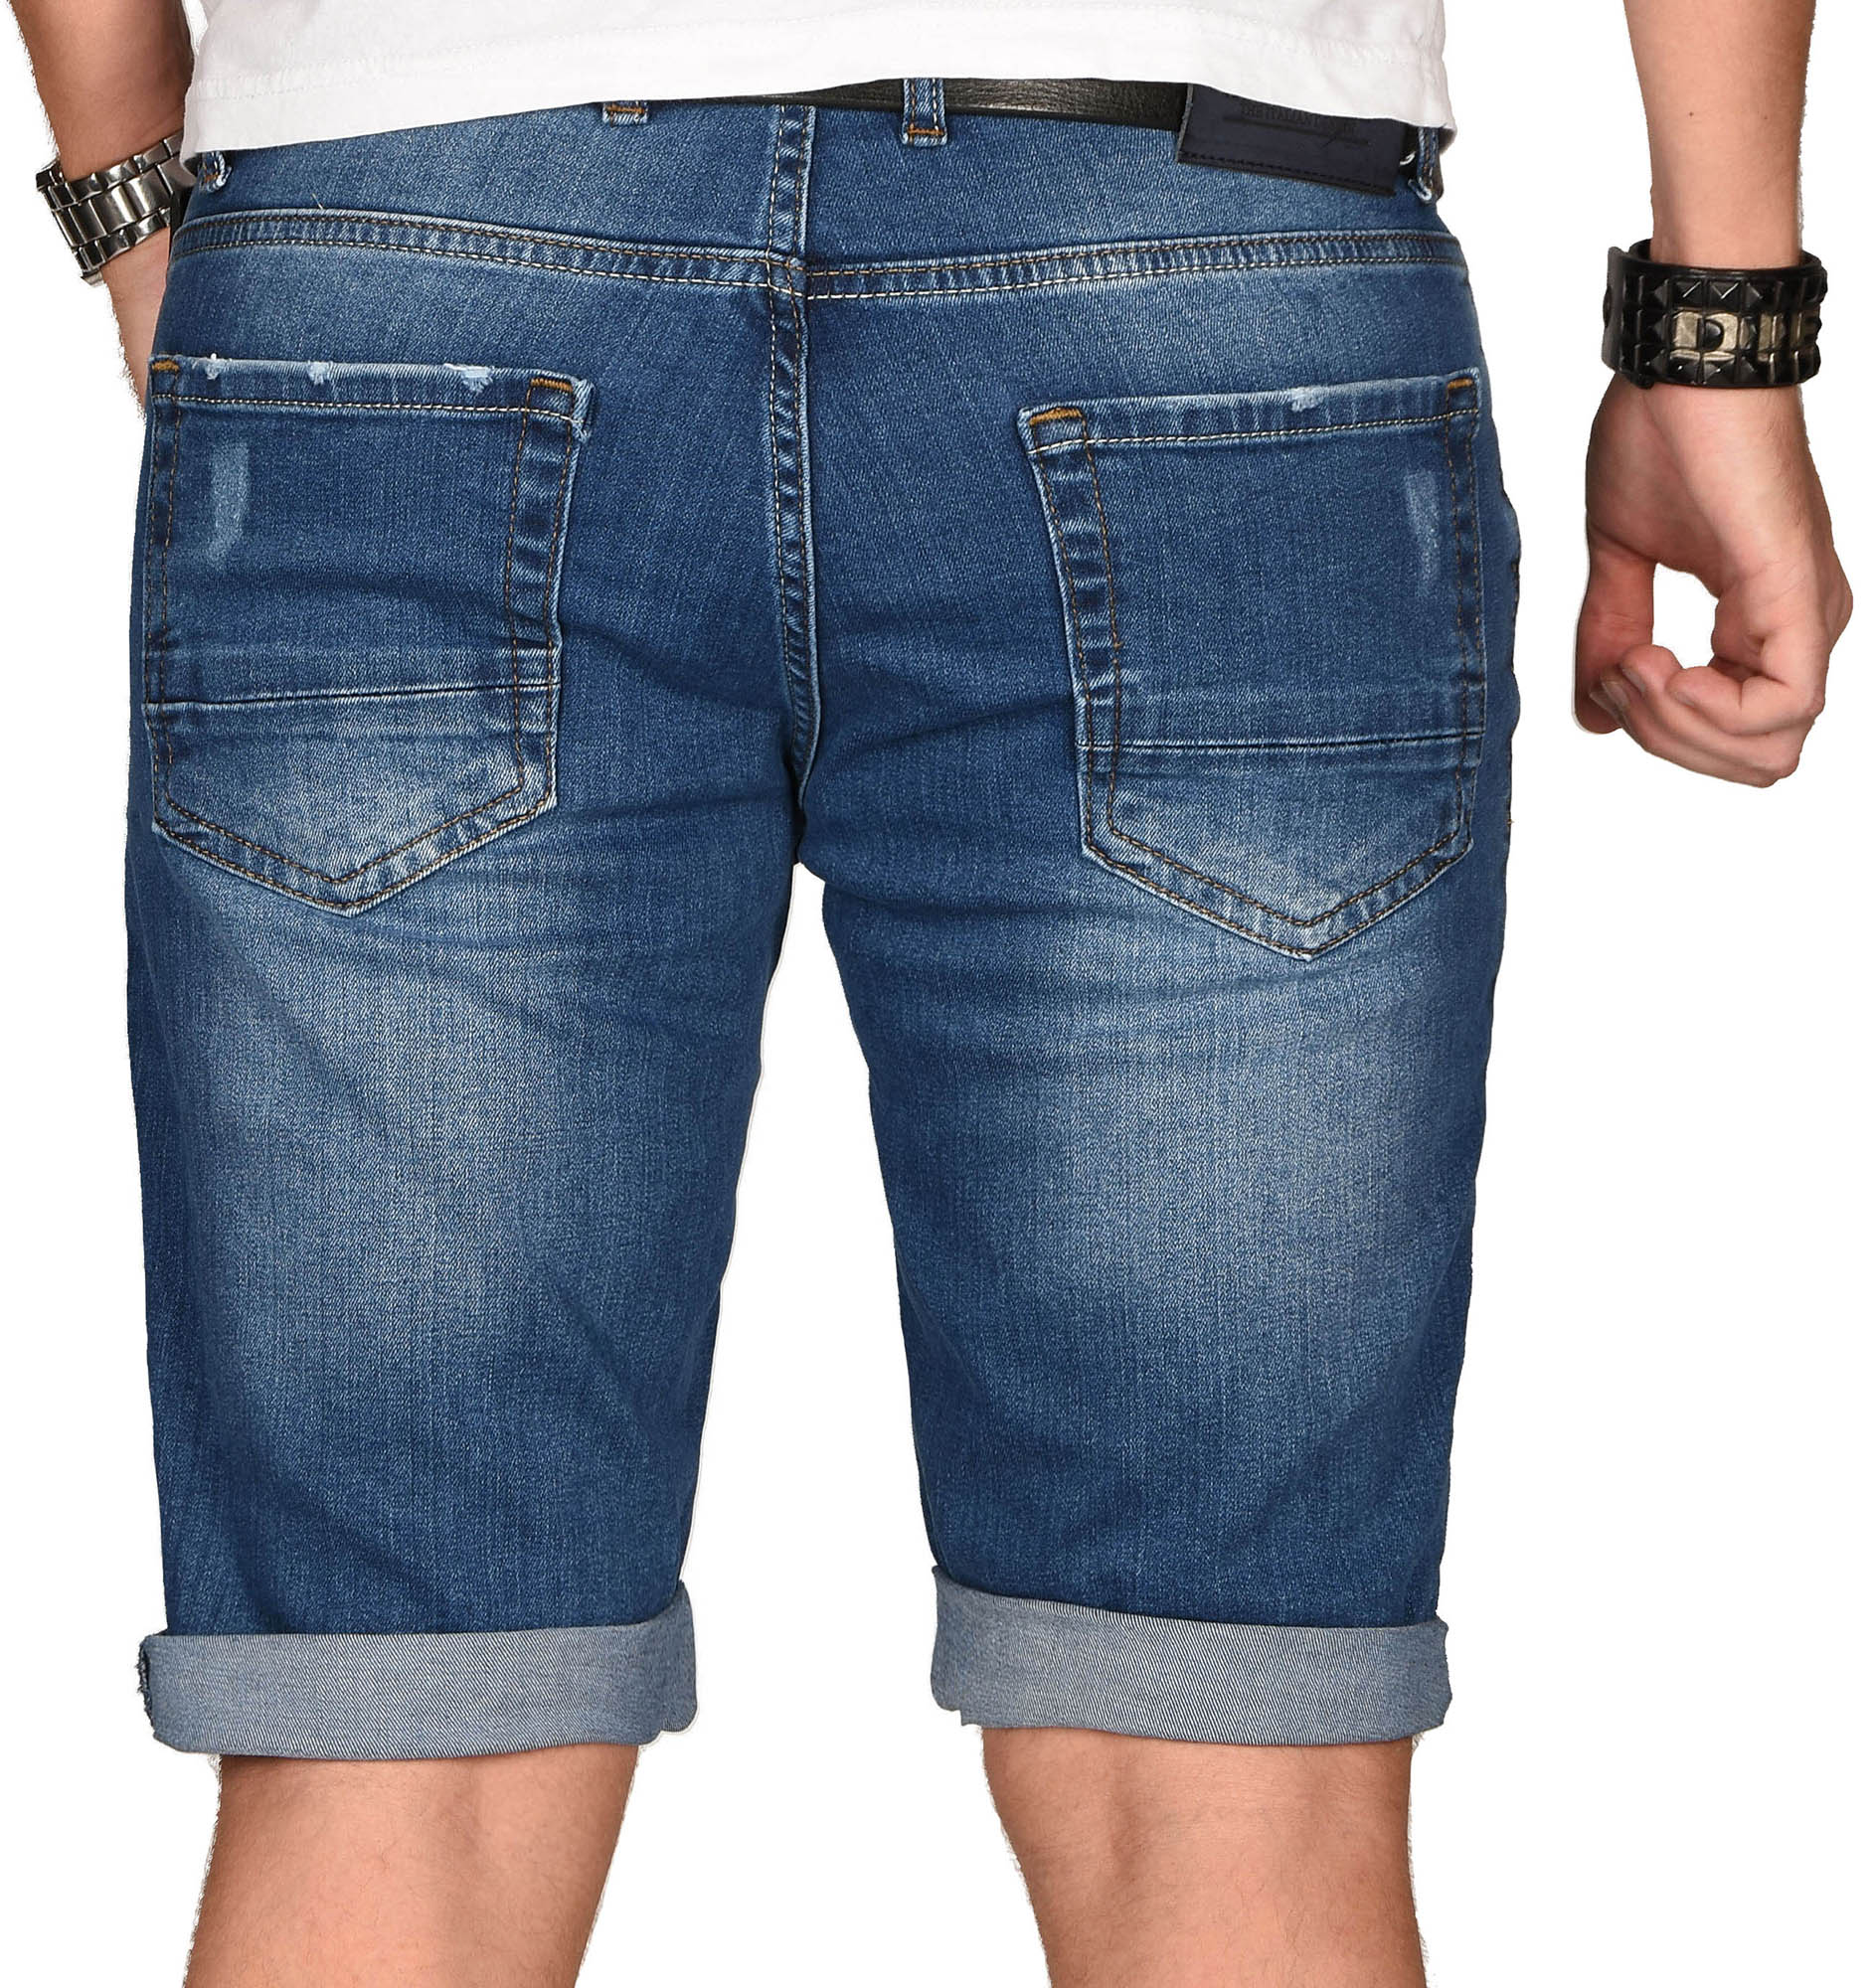 A-Salvarini-Herren-Designer-Jeans-Short-kurze-Hose-Slim-Sommer-Shorts-Bermuda Indexbild 23